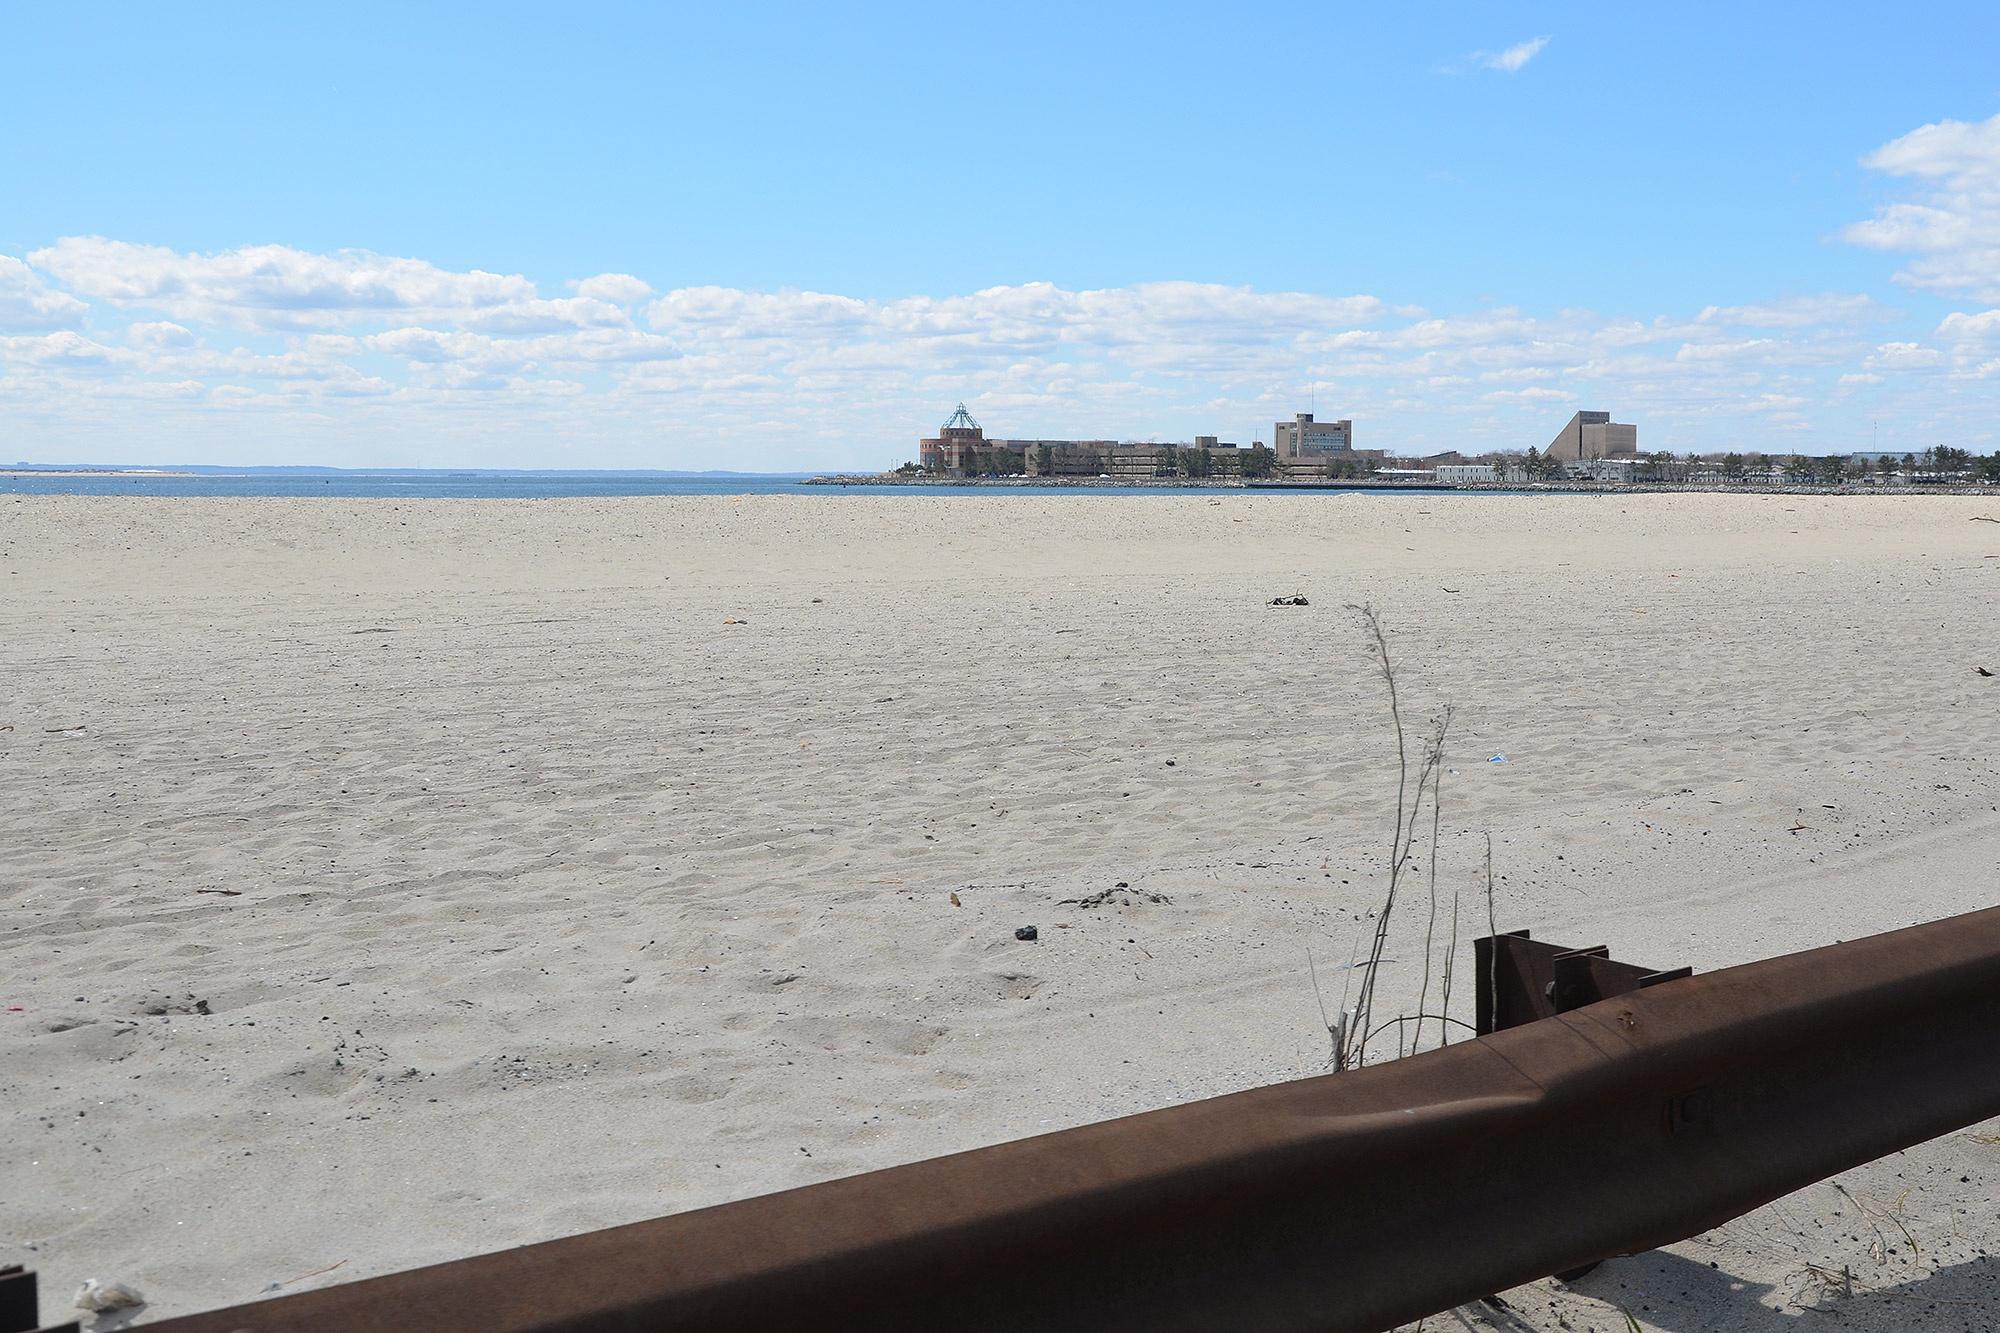 Plumb Beach, New York City, USA